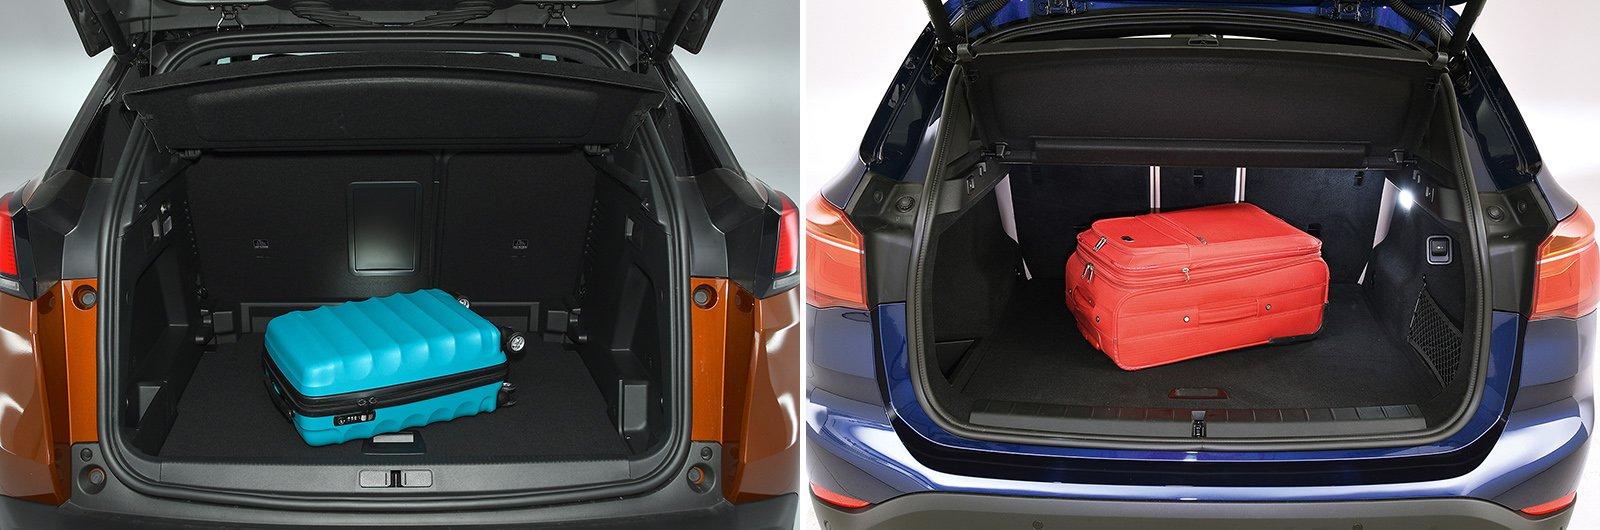 New Peugeot 3008 vs used BMW X1